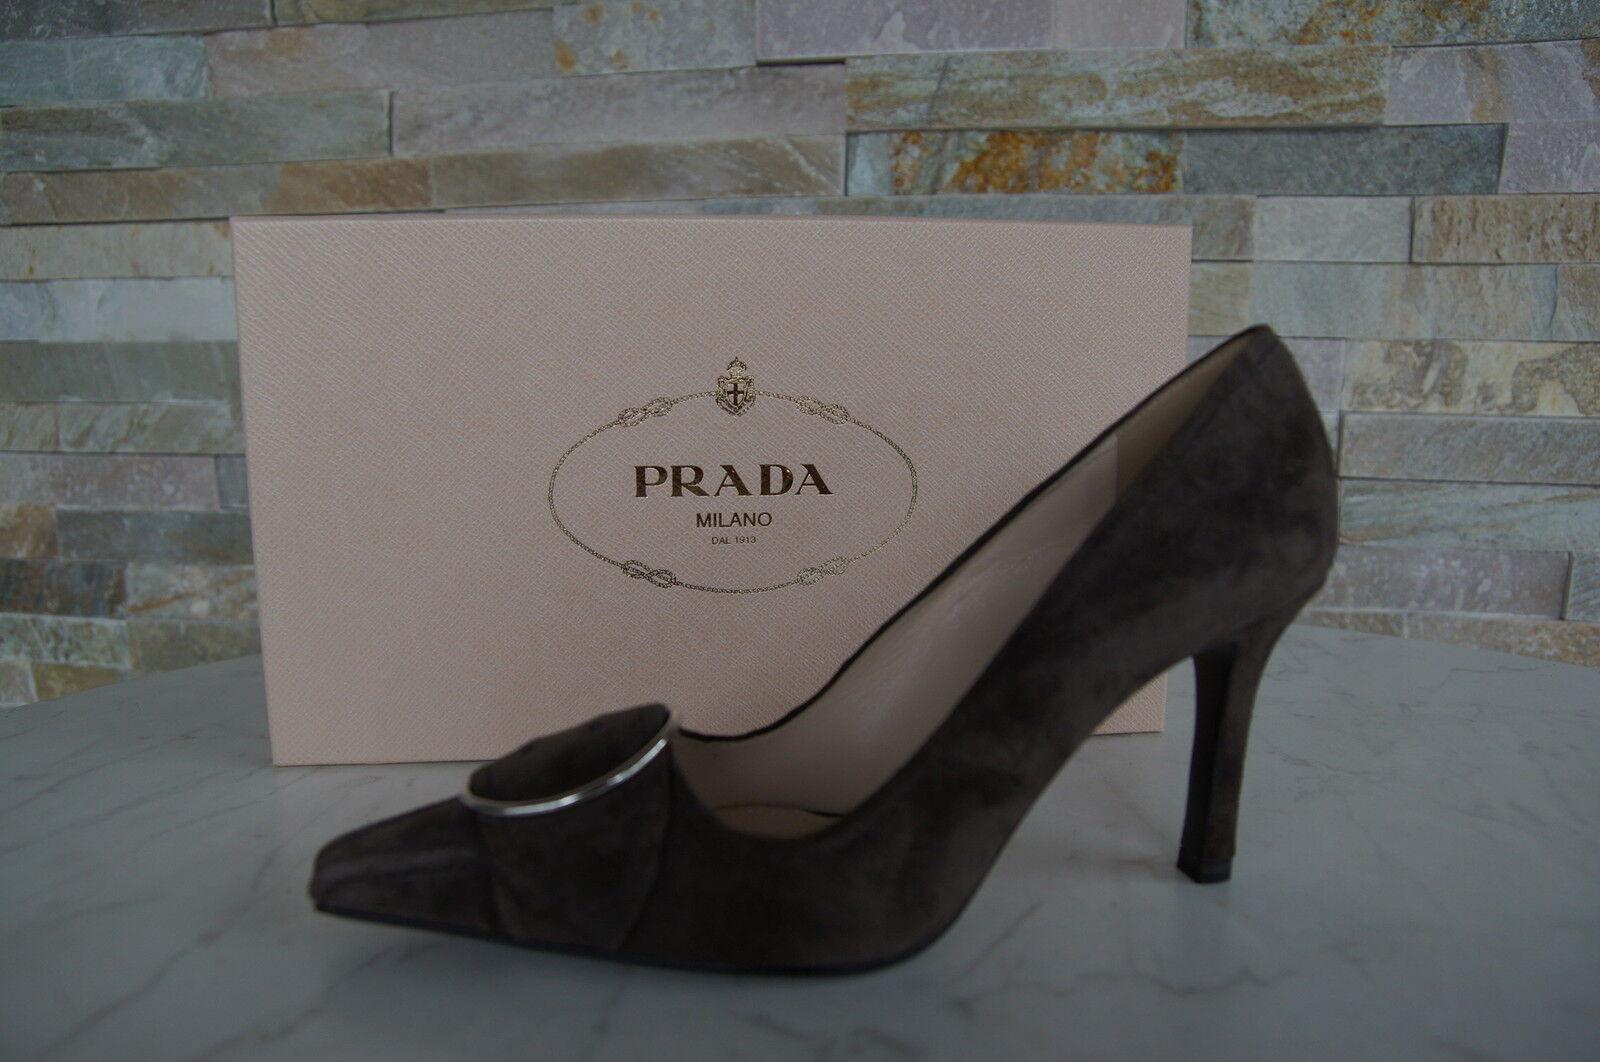 Luxus Prada Pumps Gr 36 Schuhe 1I487E schuhe 1I487E Schuhe graubraun Grau Braun NEU b29945